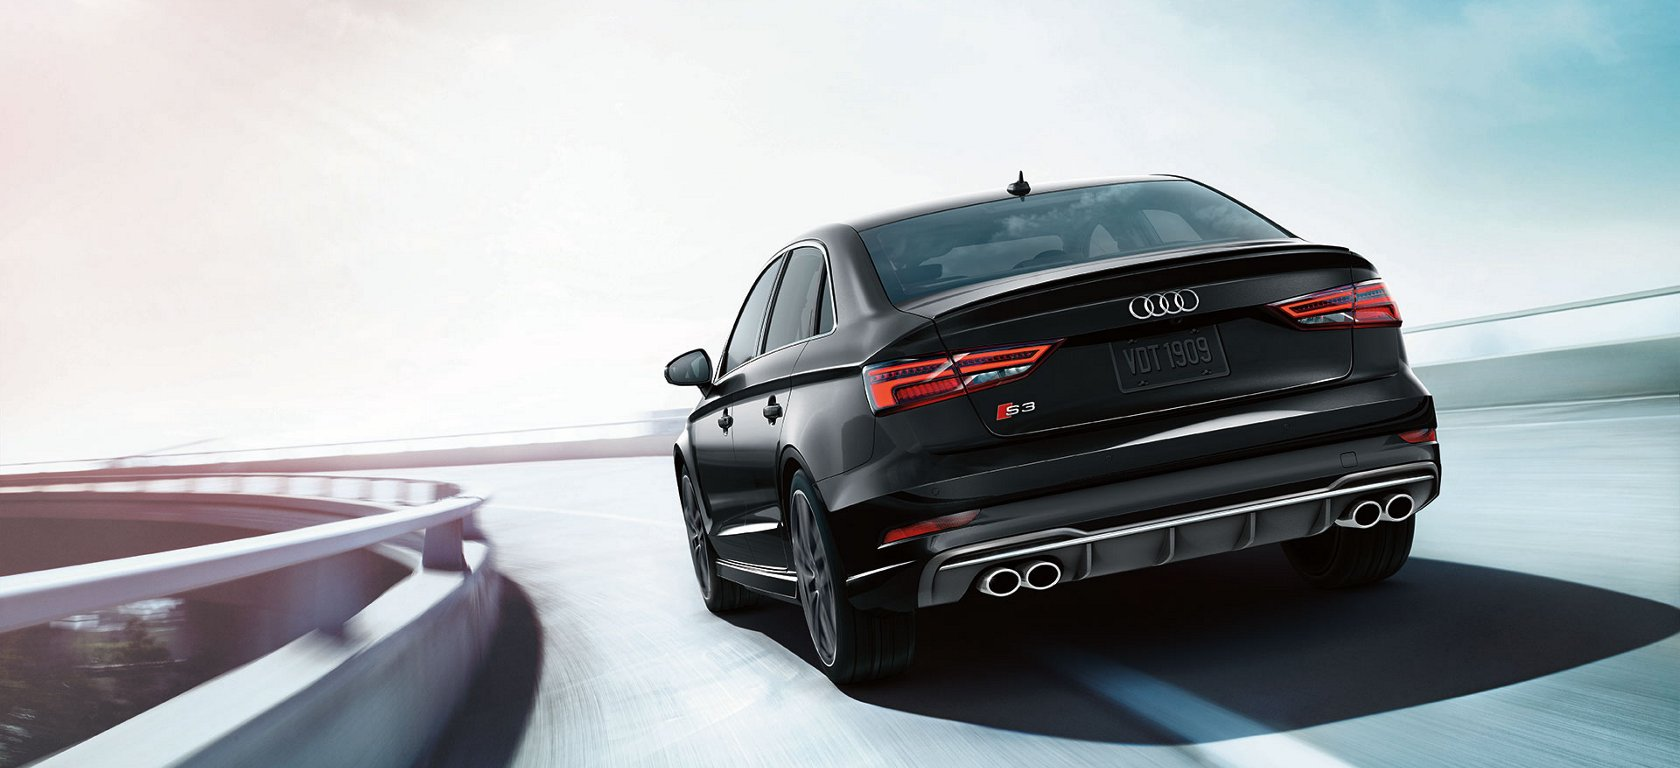 New Audi S3 Exterior main image